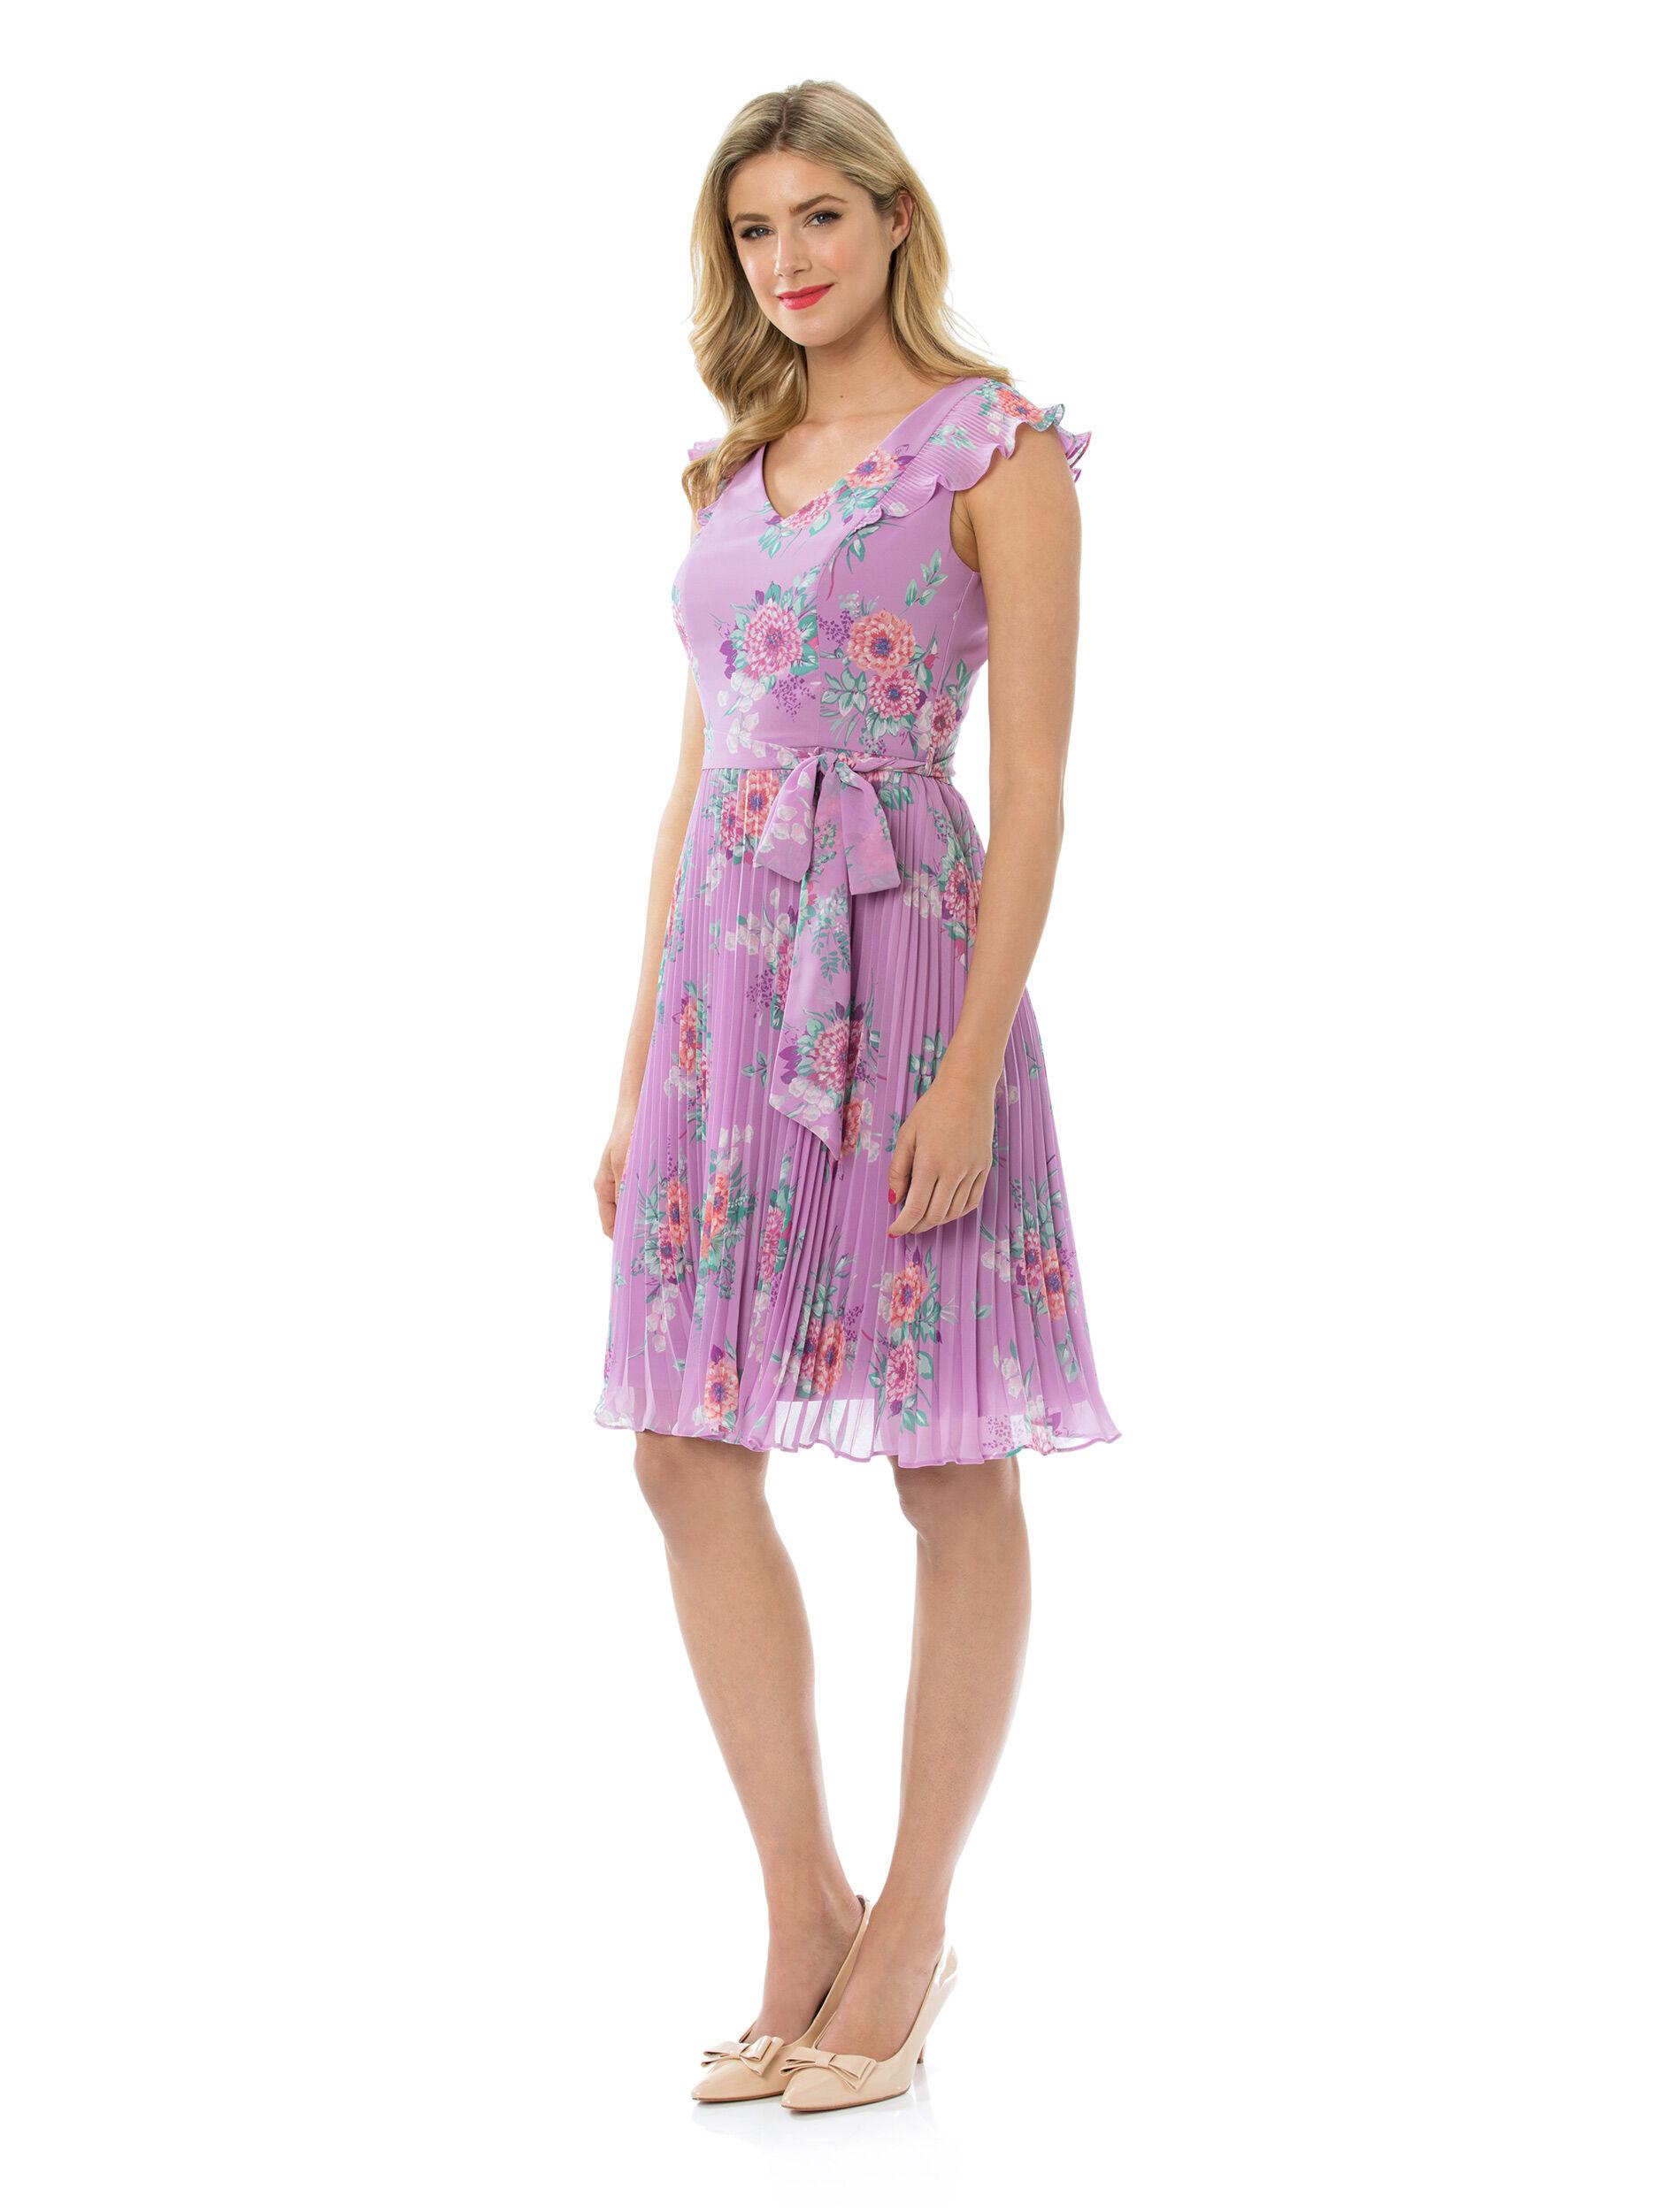 Floral Pop Dress